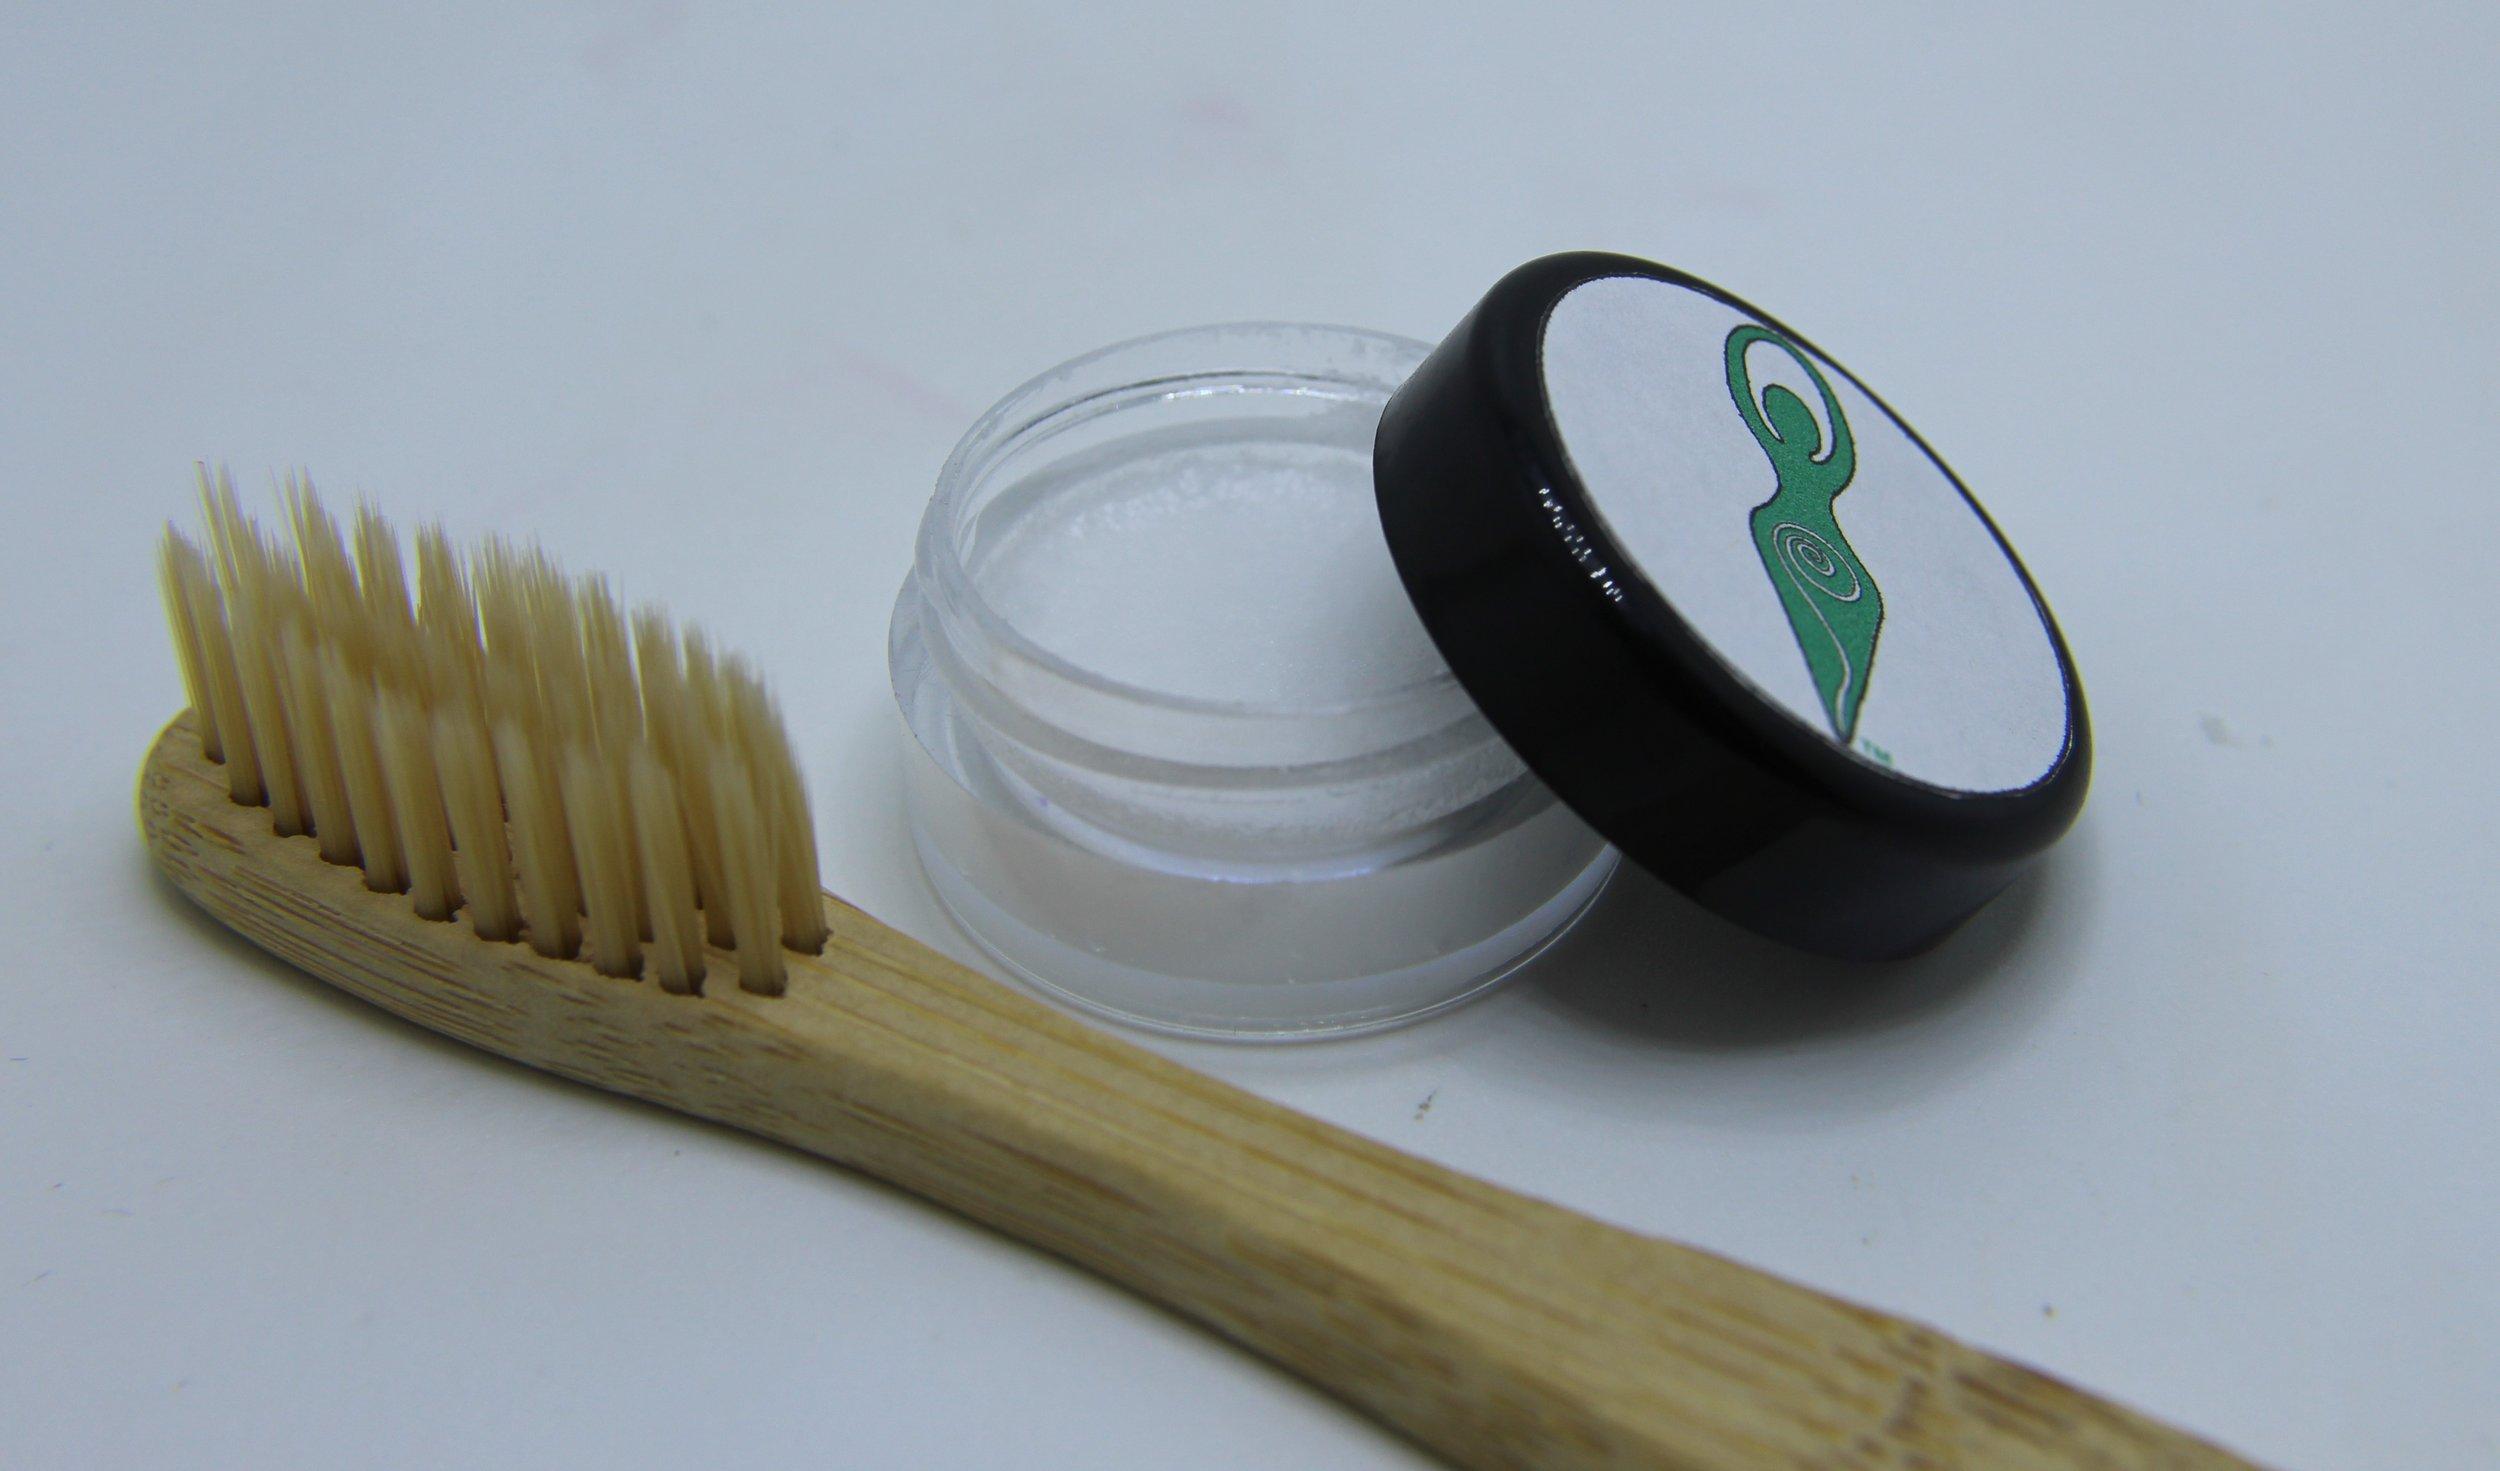 GG Peppermint Scrub - Coming Soon!